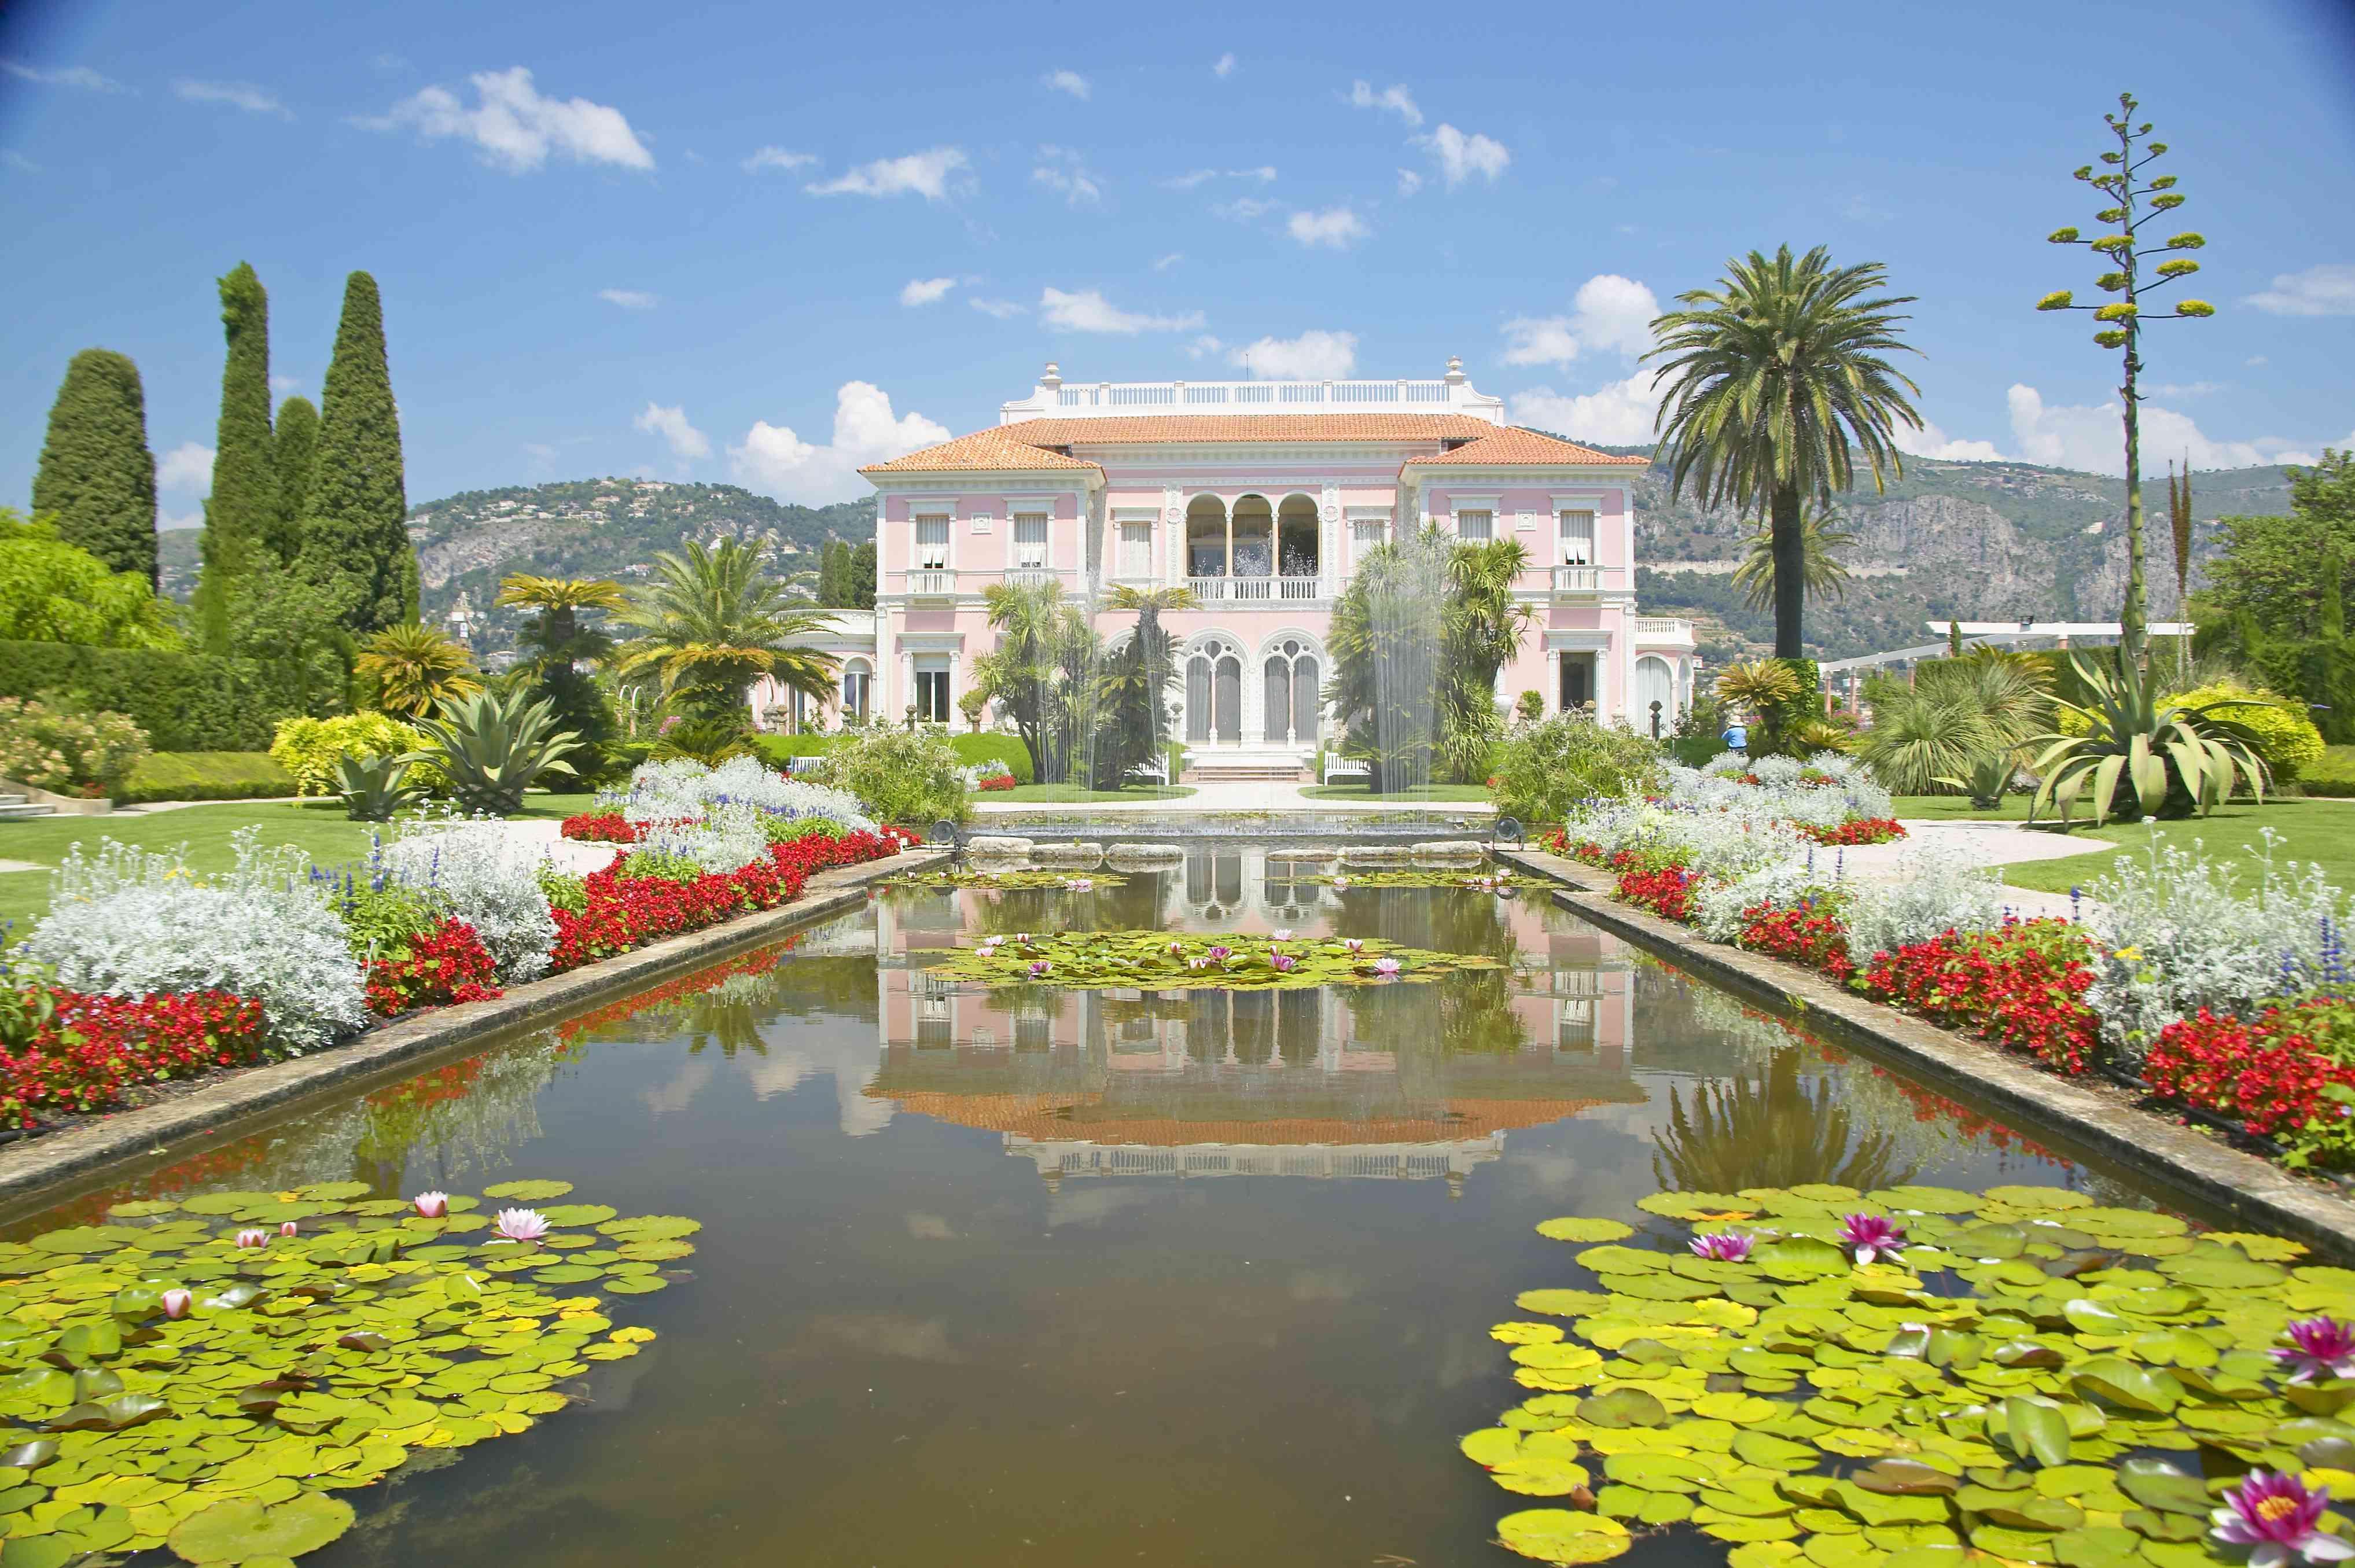 The Gardens and Villa Ephrussi de Rothschild, Saint-Jean-Cap-Ferrat, France